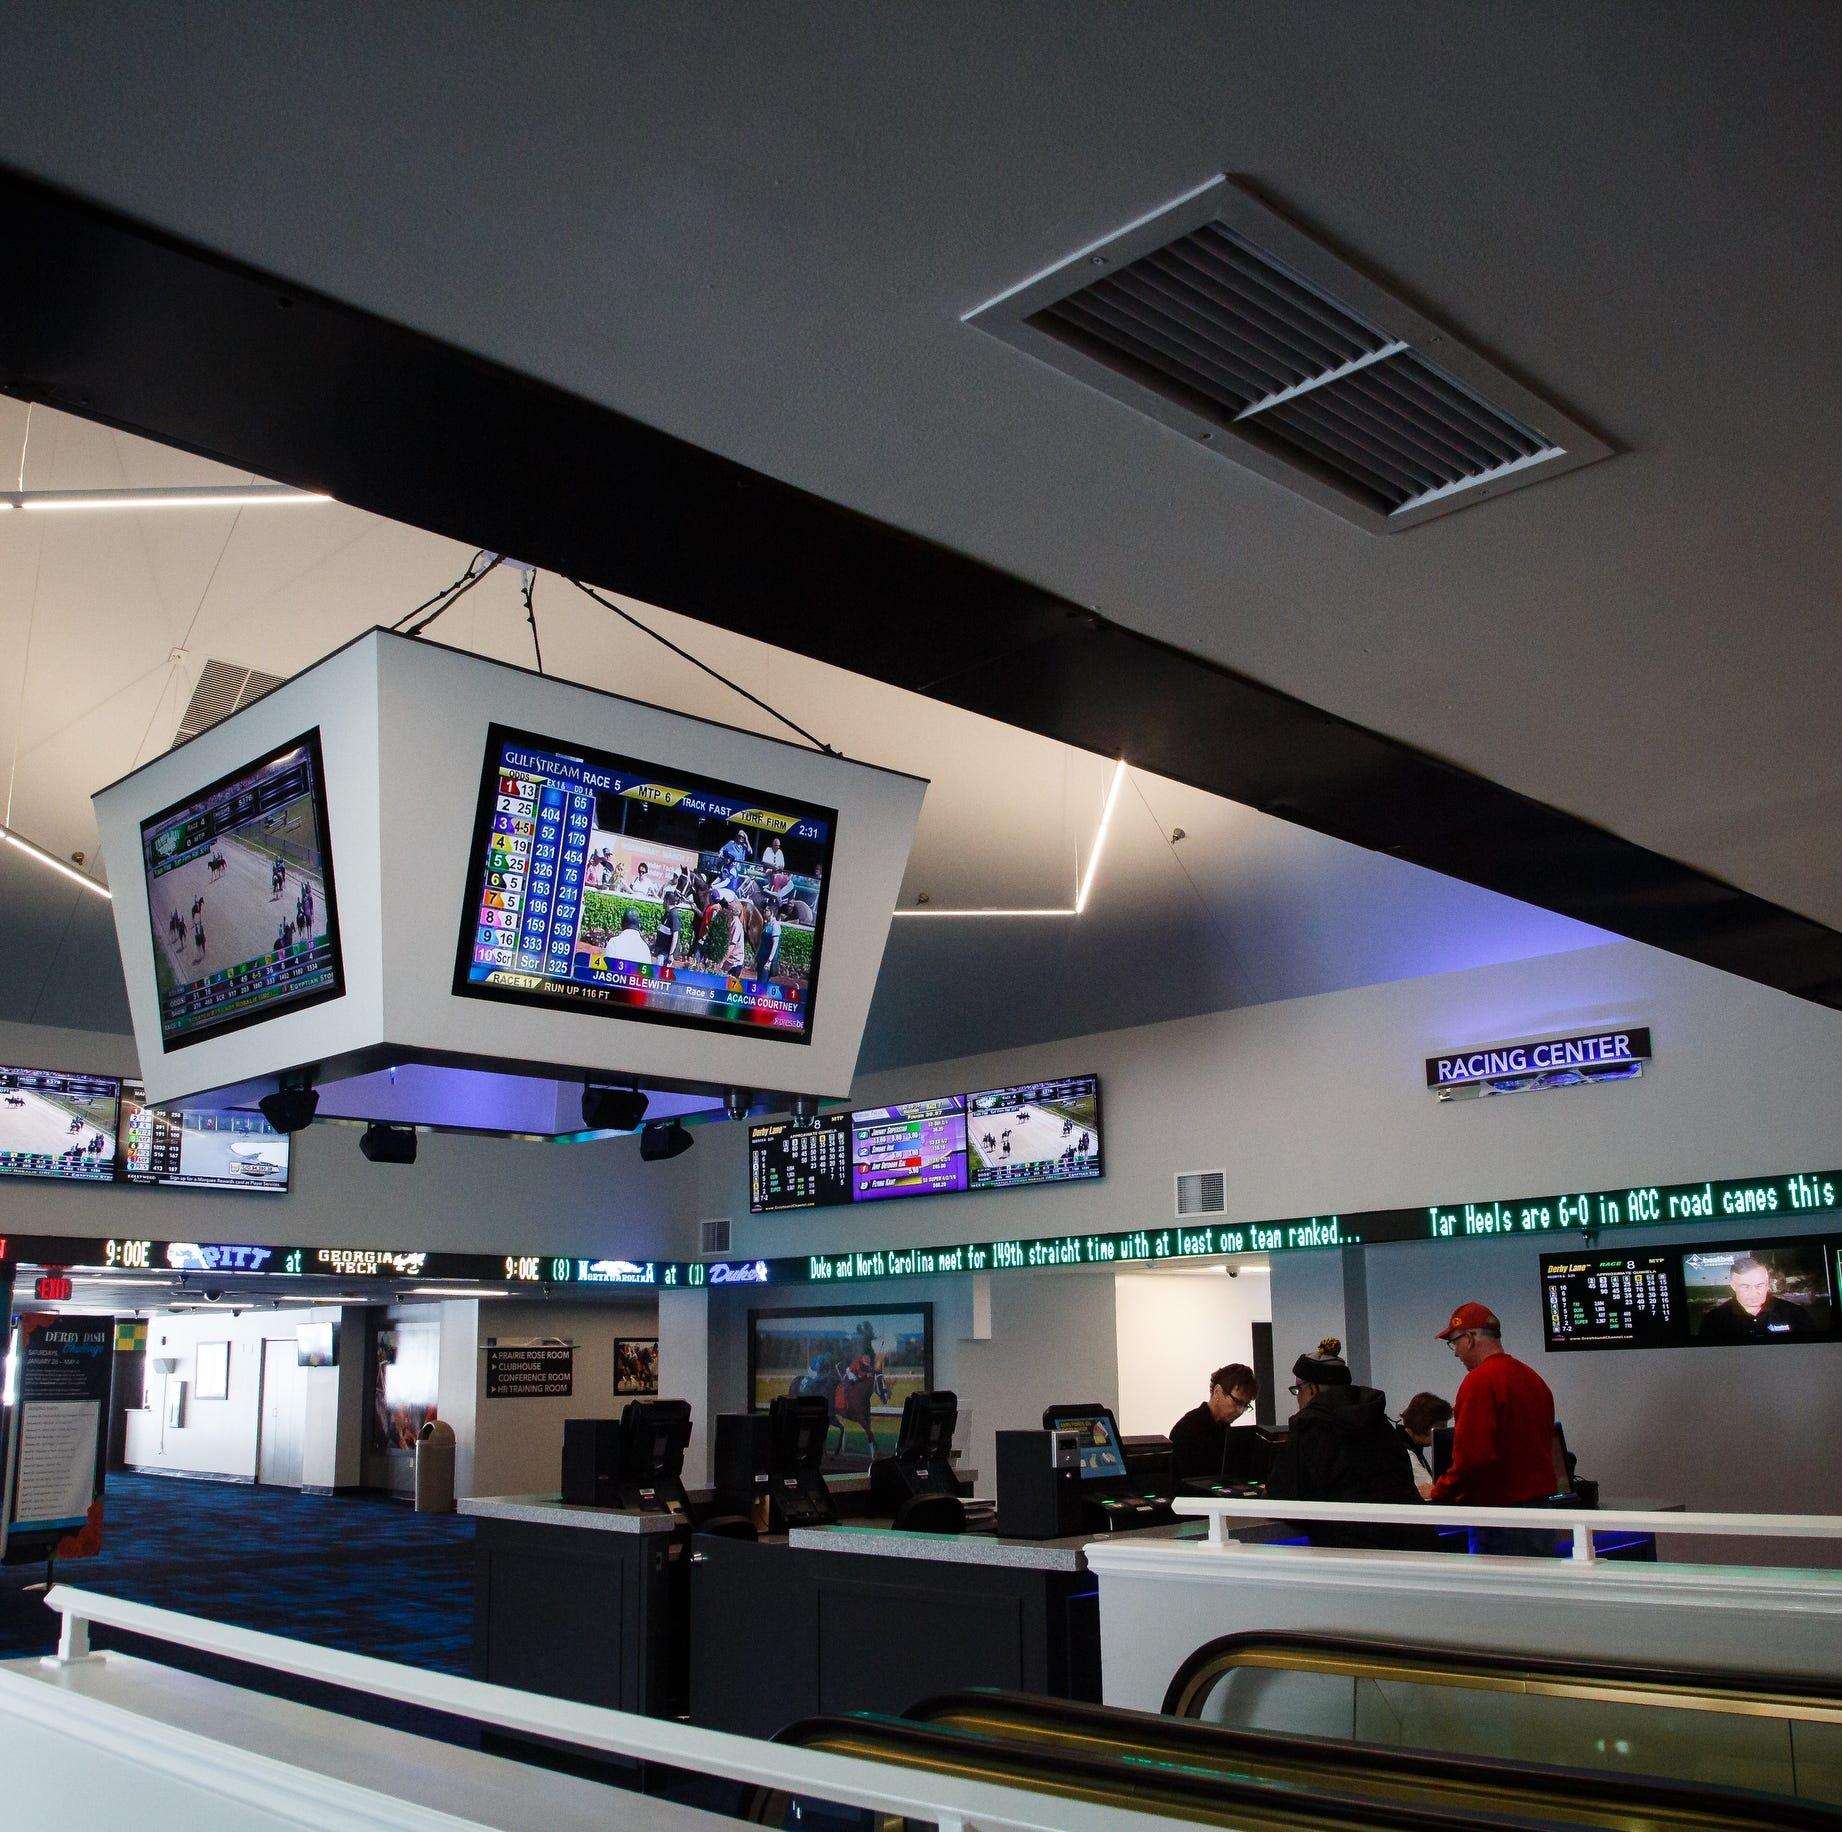 Prairie Meadows bets big on Iowa sports gambling